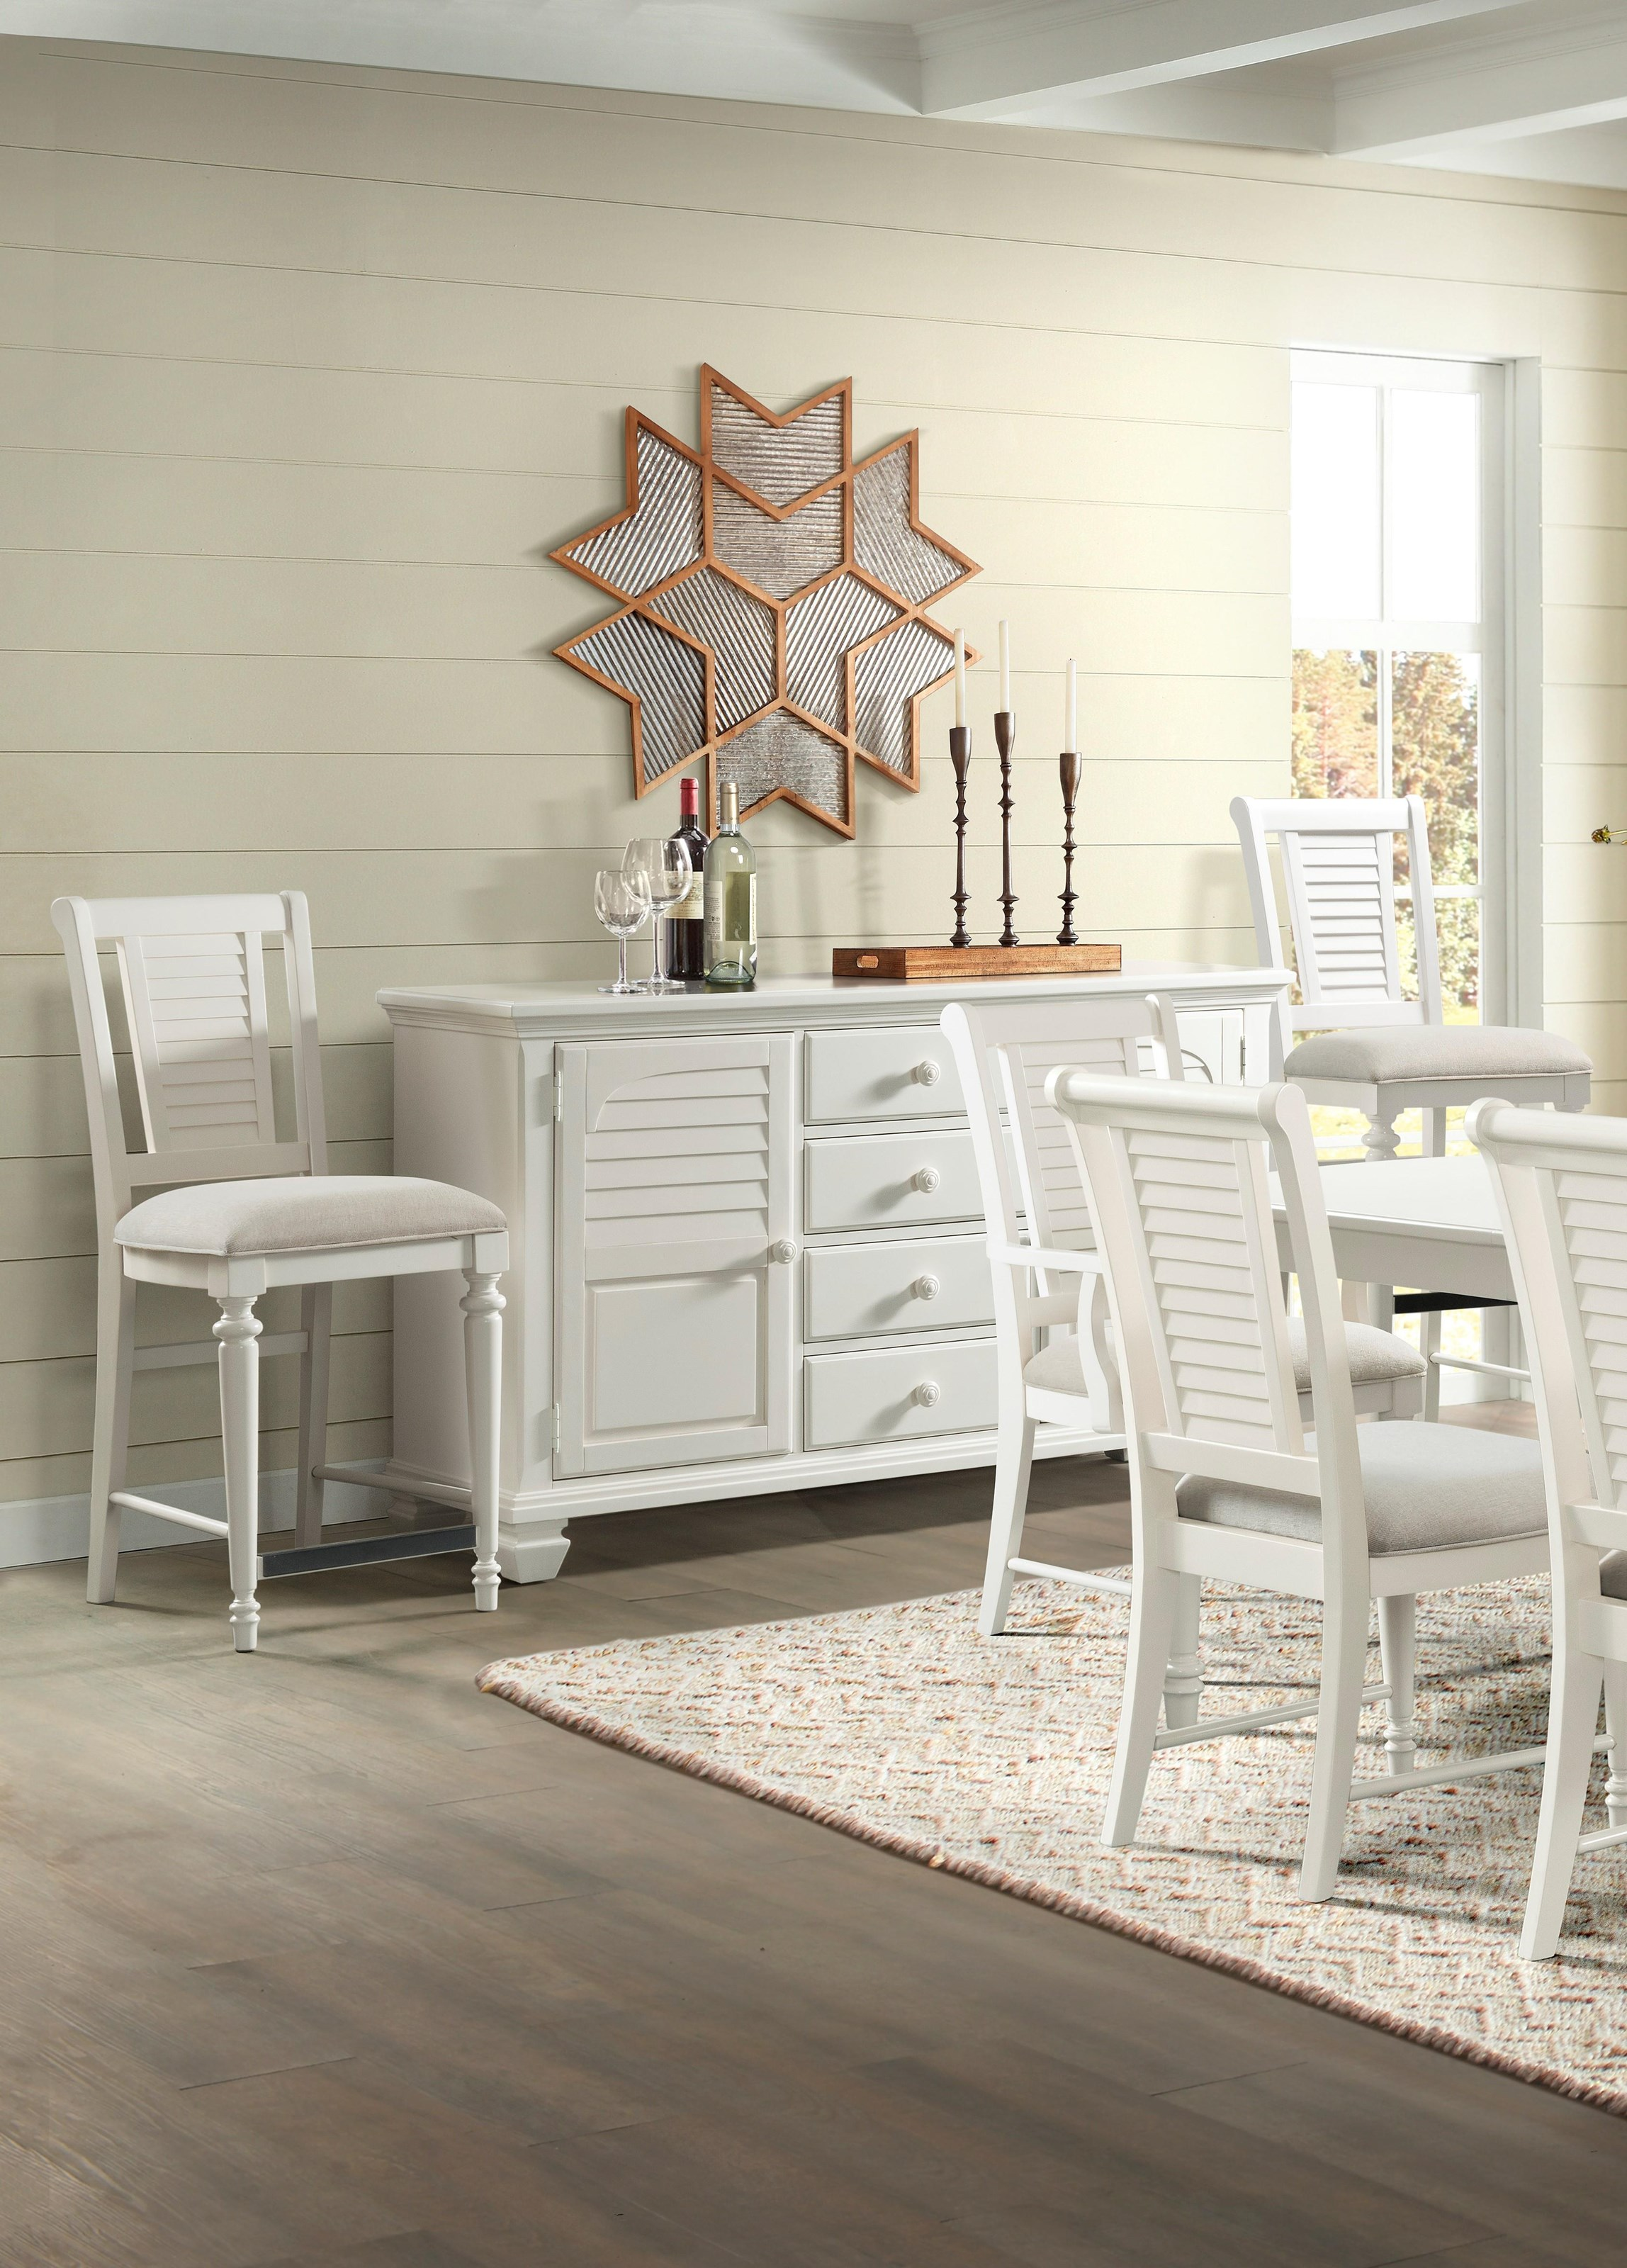 Harbortown Dining Room Server by Stillwater Furniture at Baer's Furniture